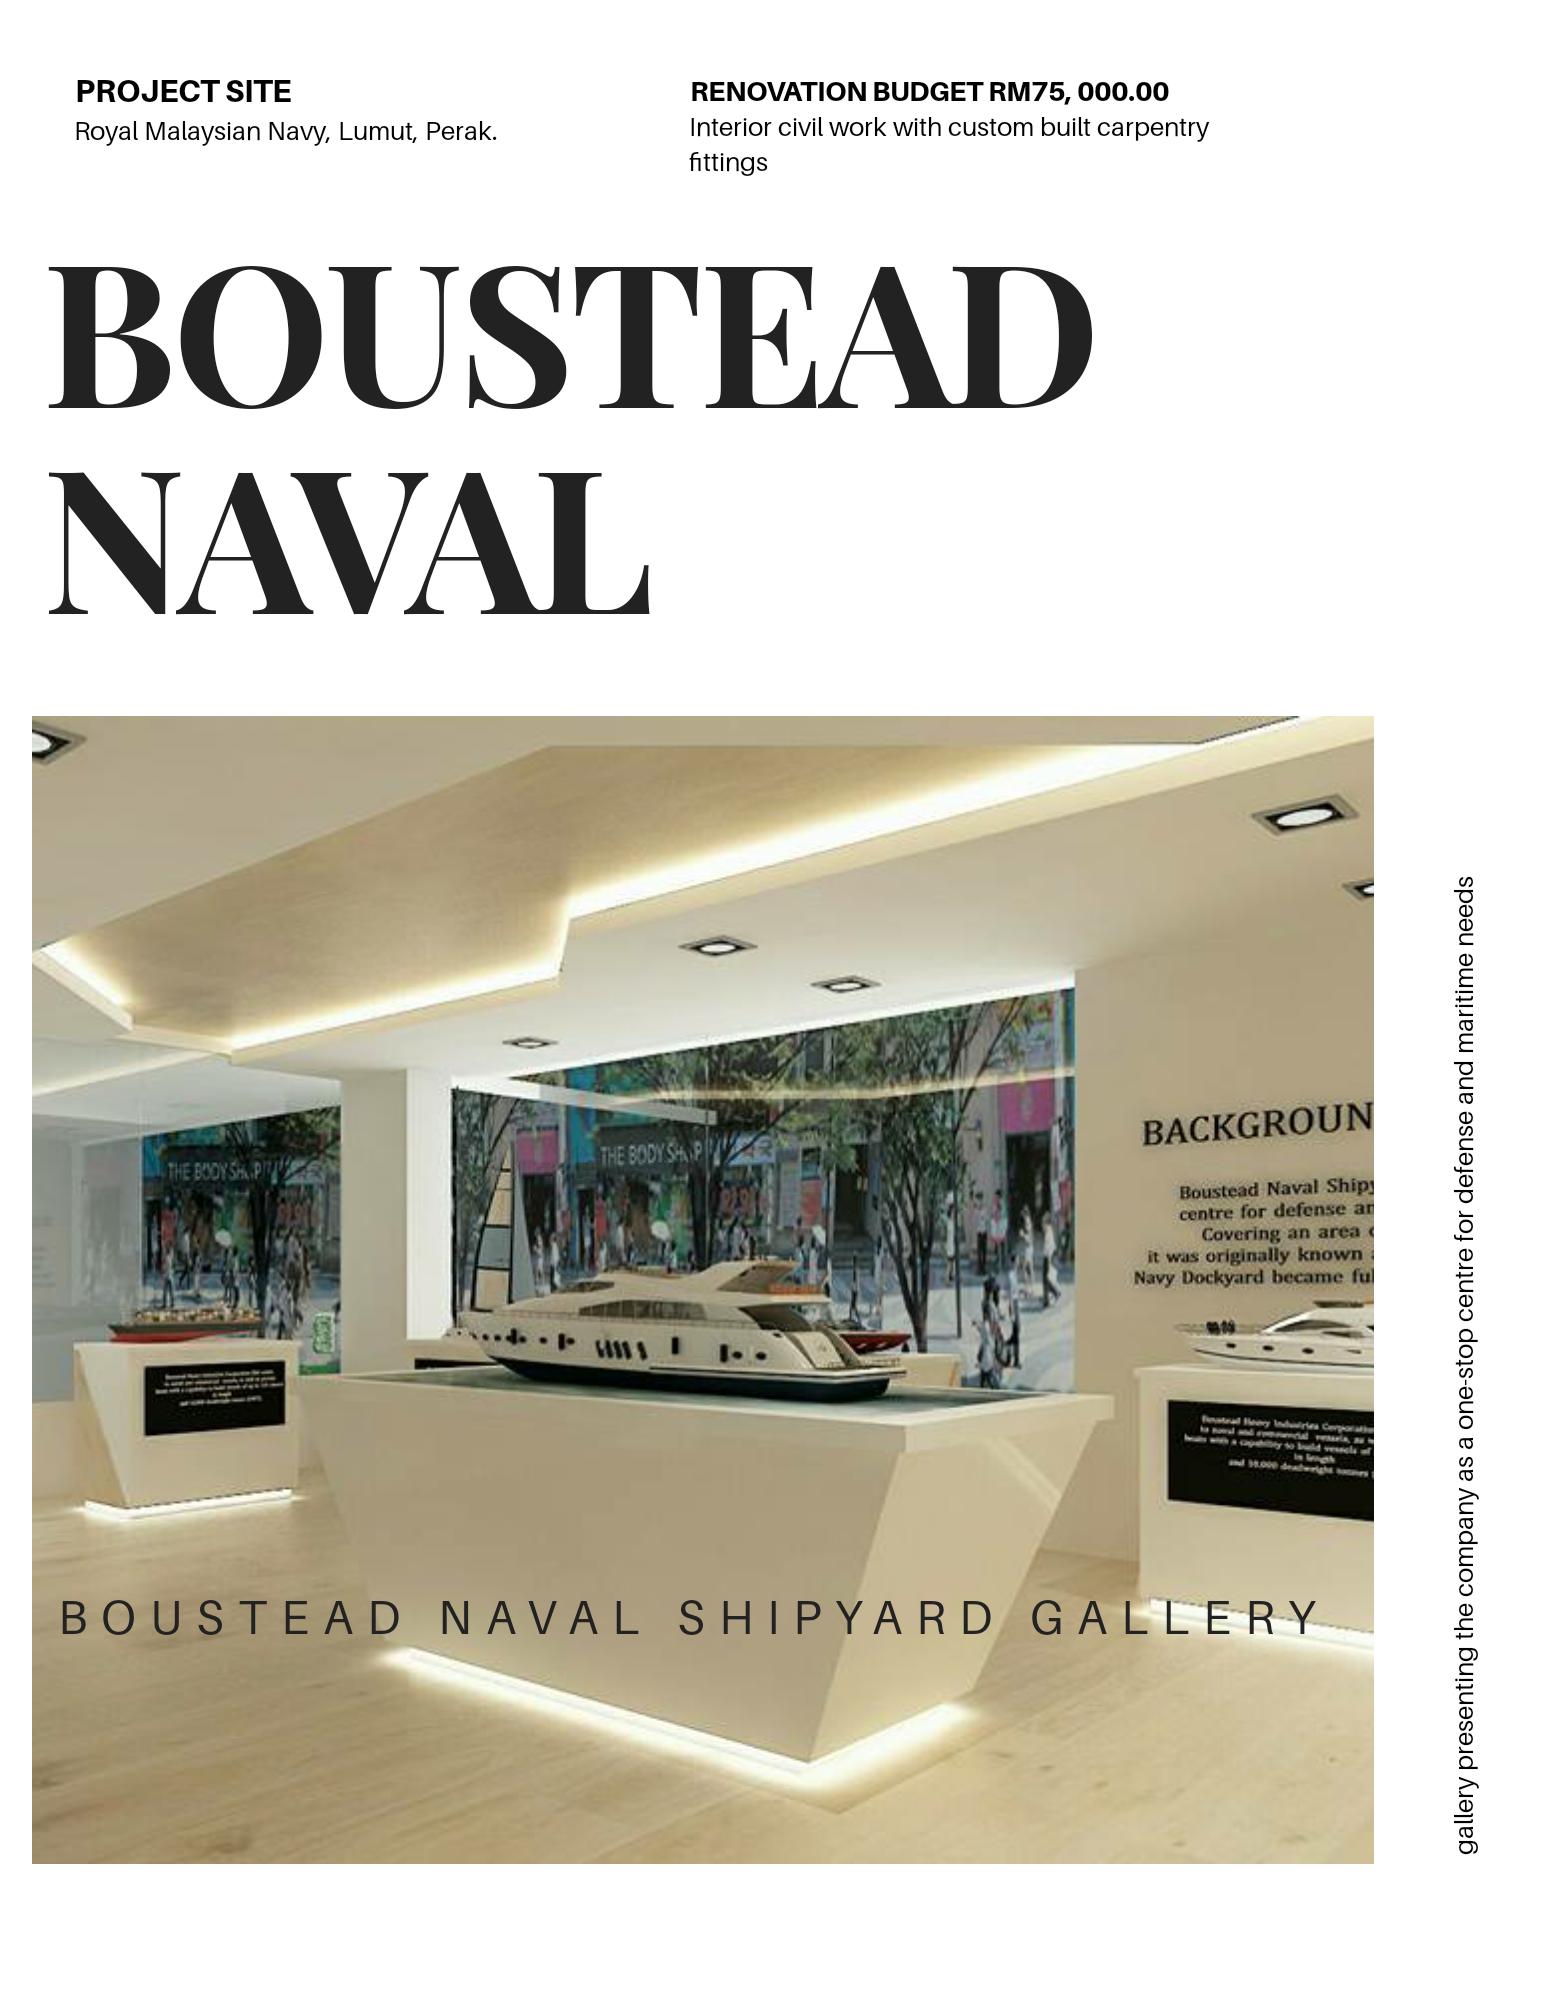 BOUSTEAD NAVAL SHIPYARD GALLERY